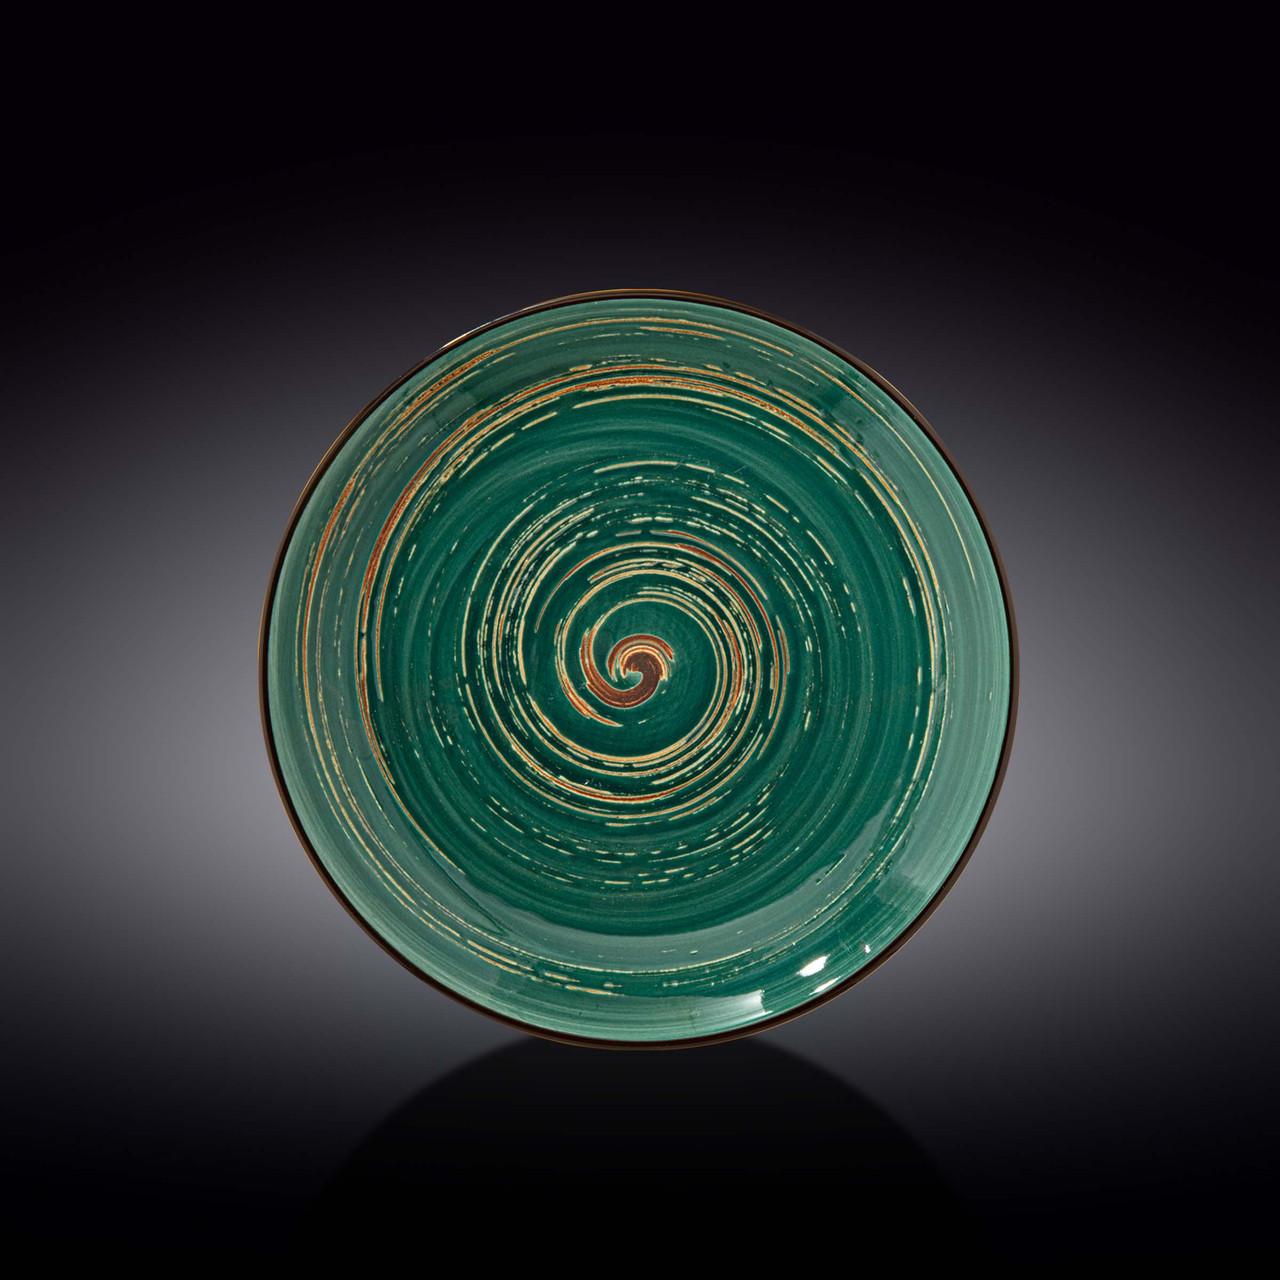 Тарелка обеденная Wilmax Spiral 25,5 см